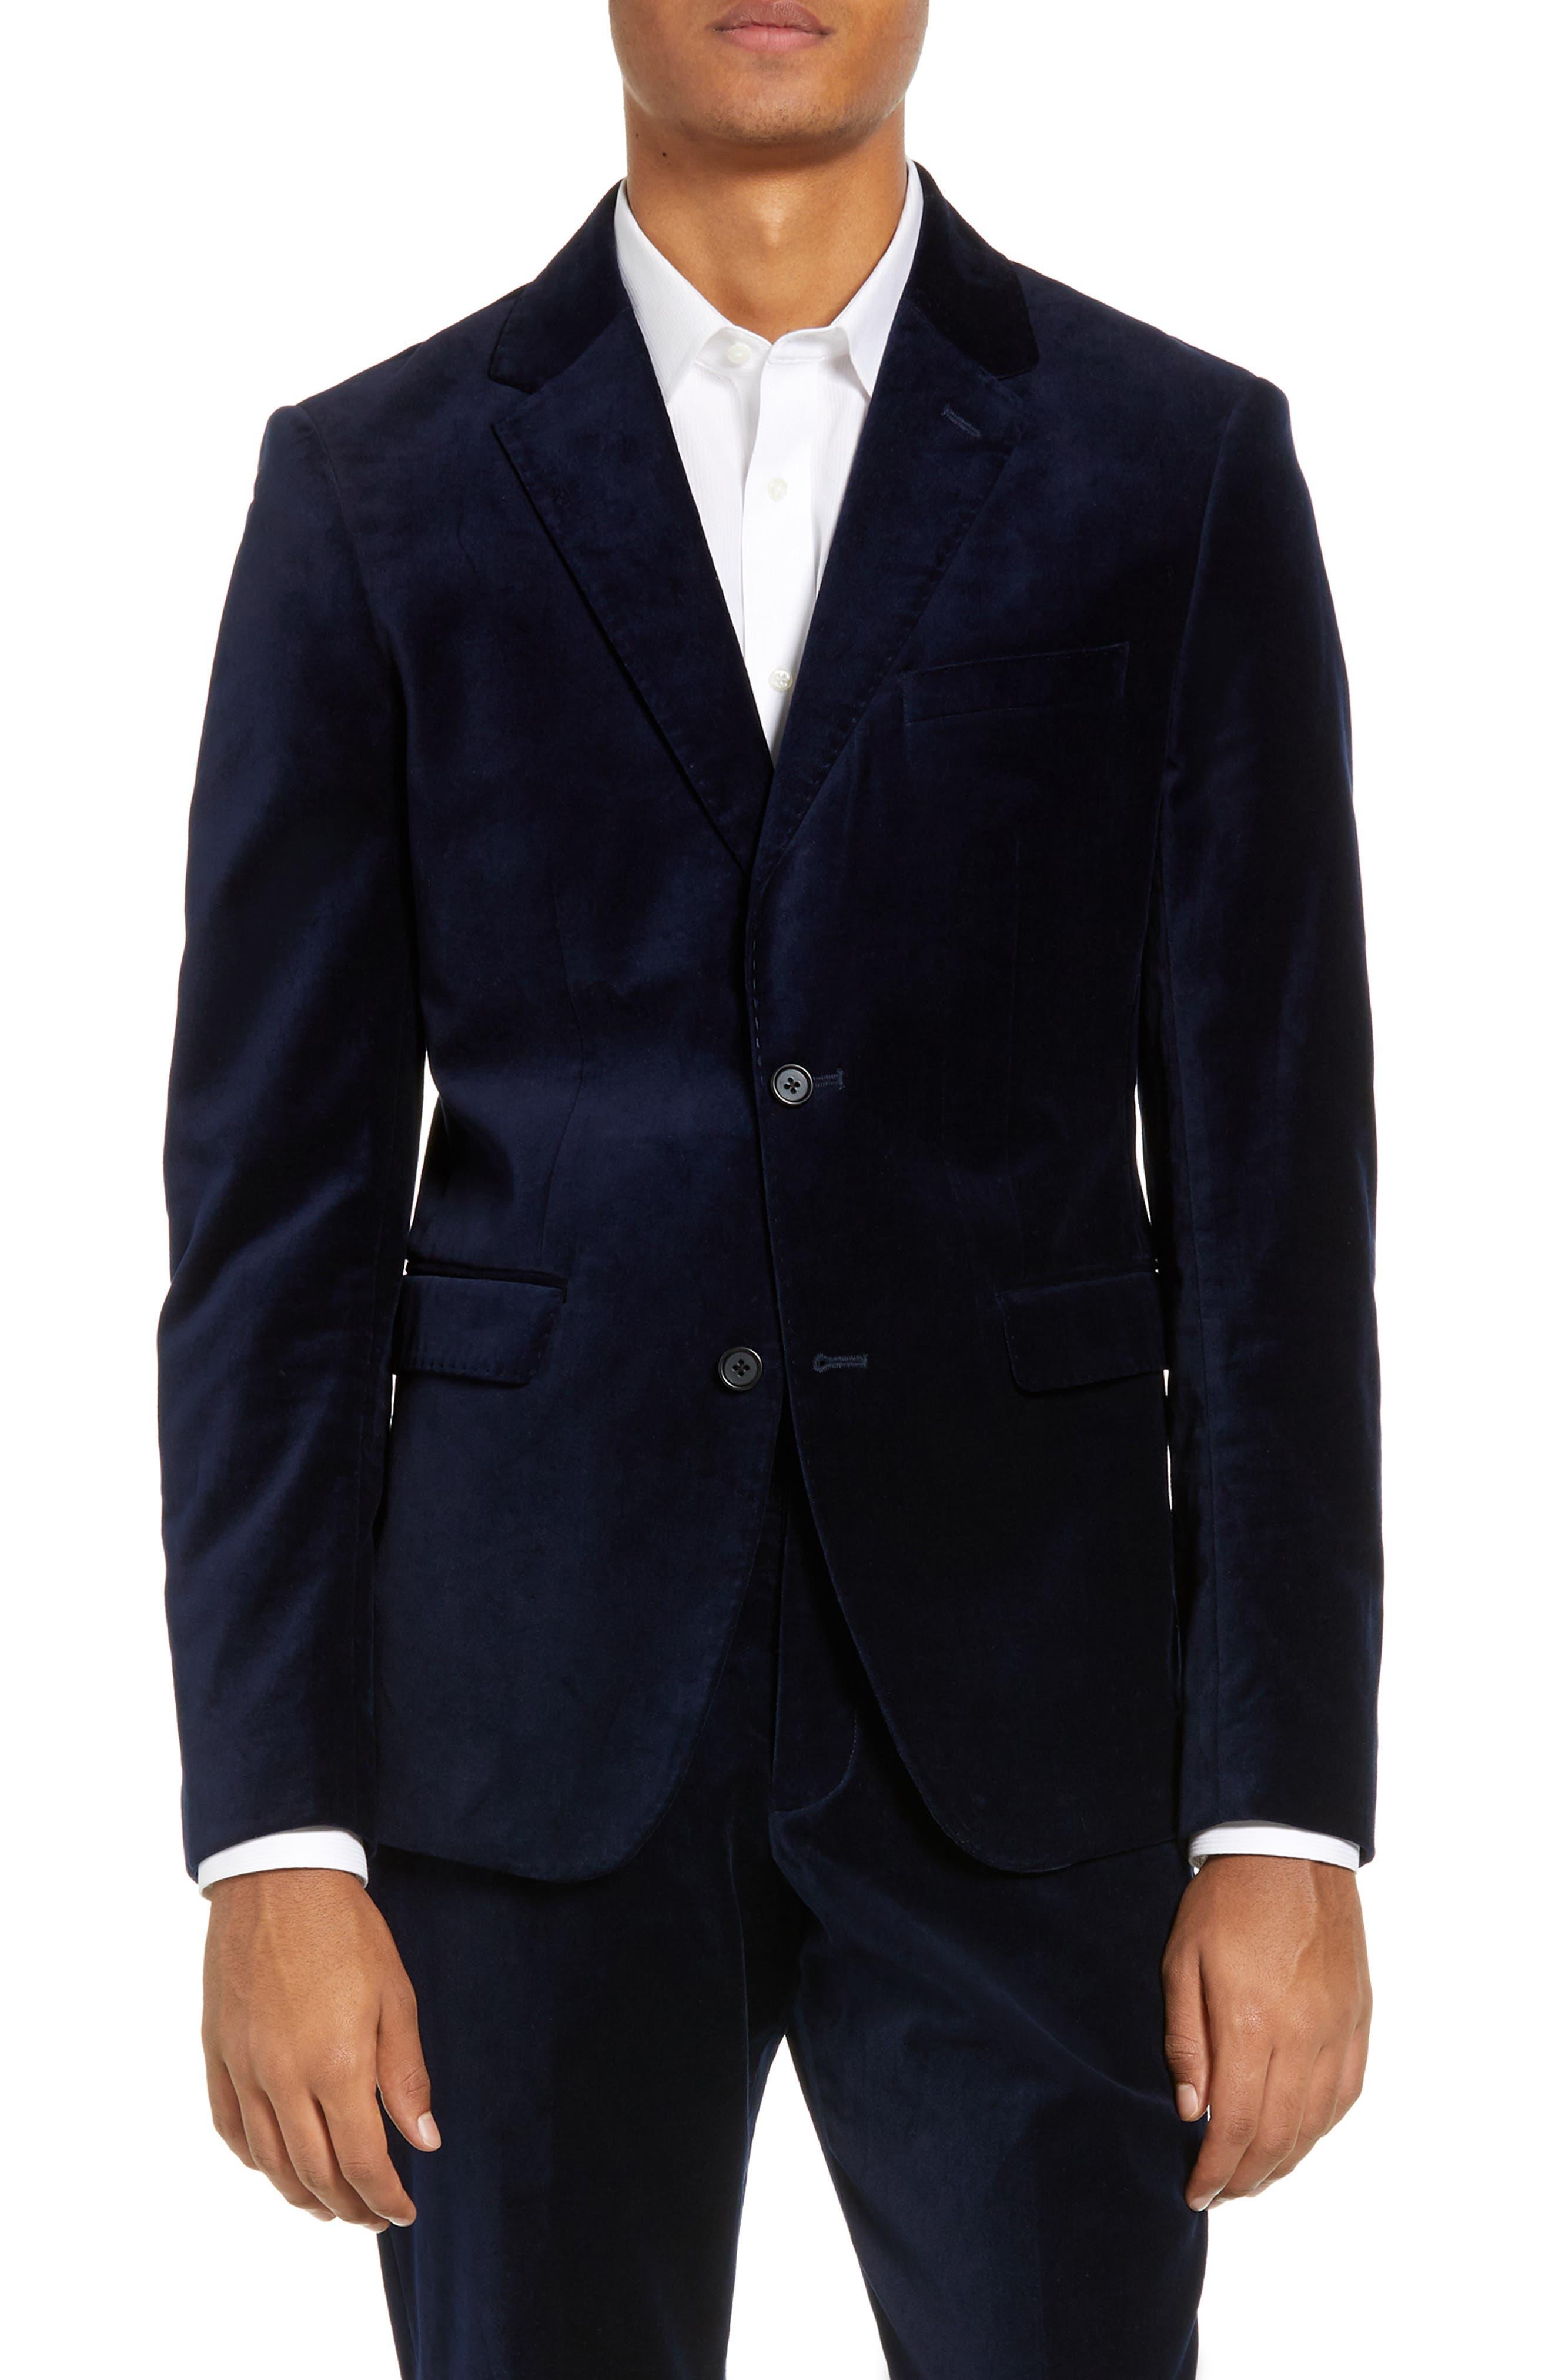 FRENCH CONNECTION Regular Fit Plush Velveteen Blazer, Main, color, BLUE BLOOD